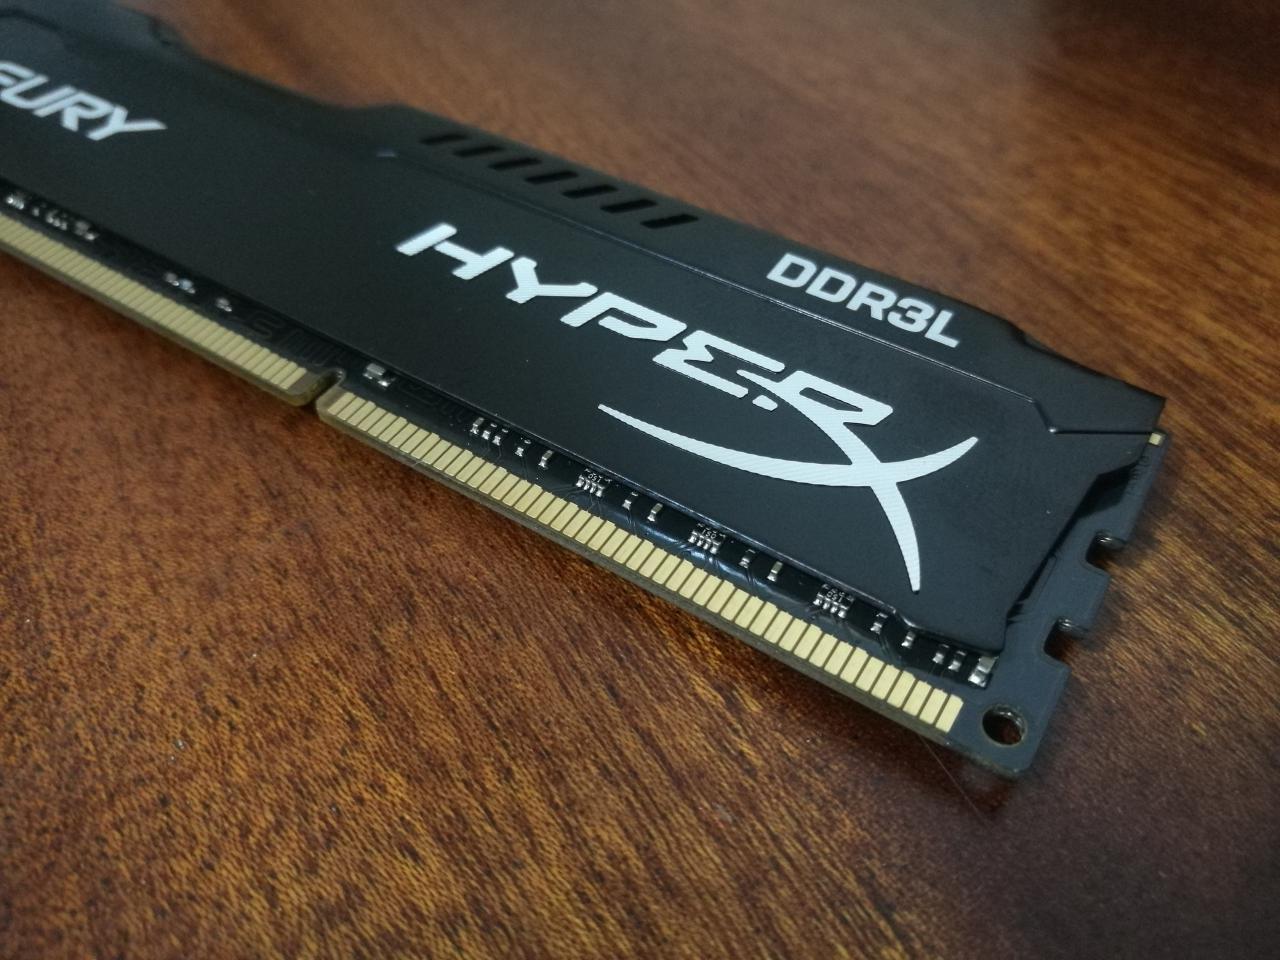 kingston ddr3l 7 - Как сэкономить на оперативной памяти и не проиграть. Обзор HyperX FURY DDR3L